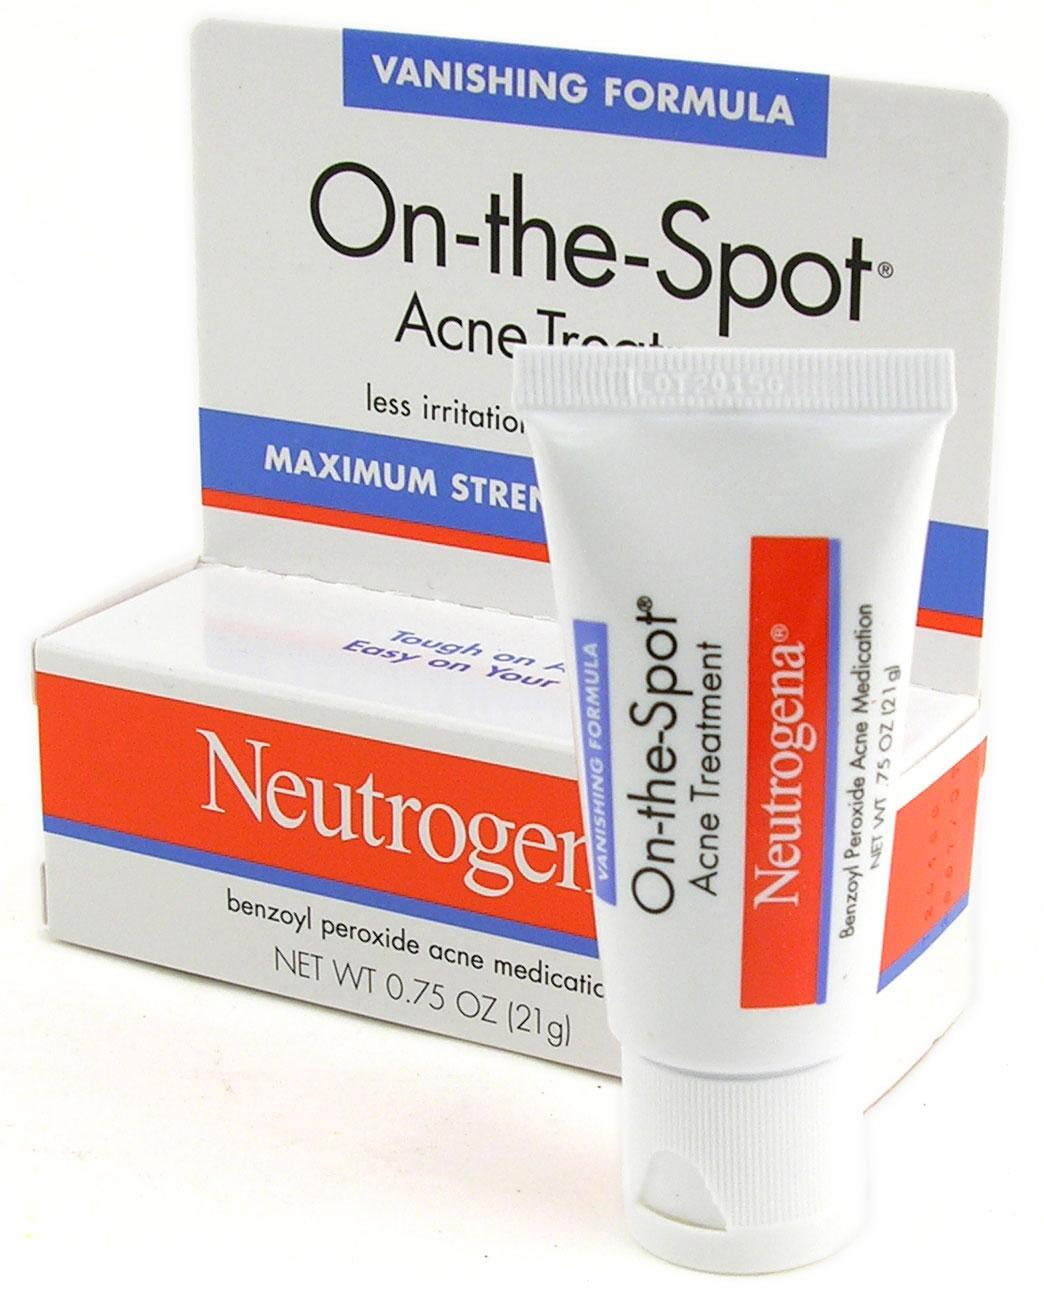 acne skin care neutrogena onthespot acne treatment review